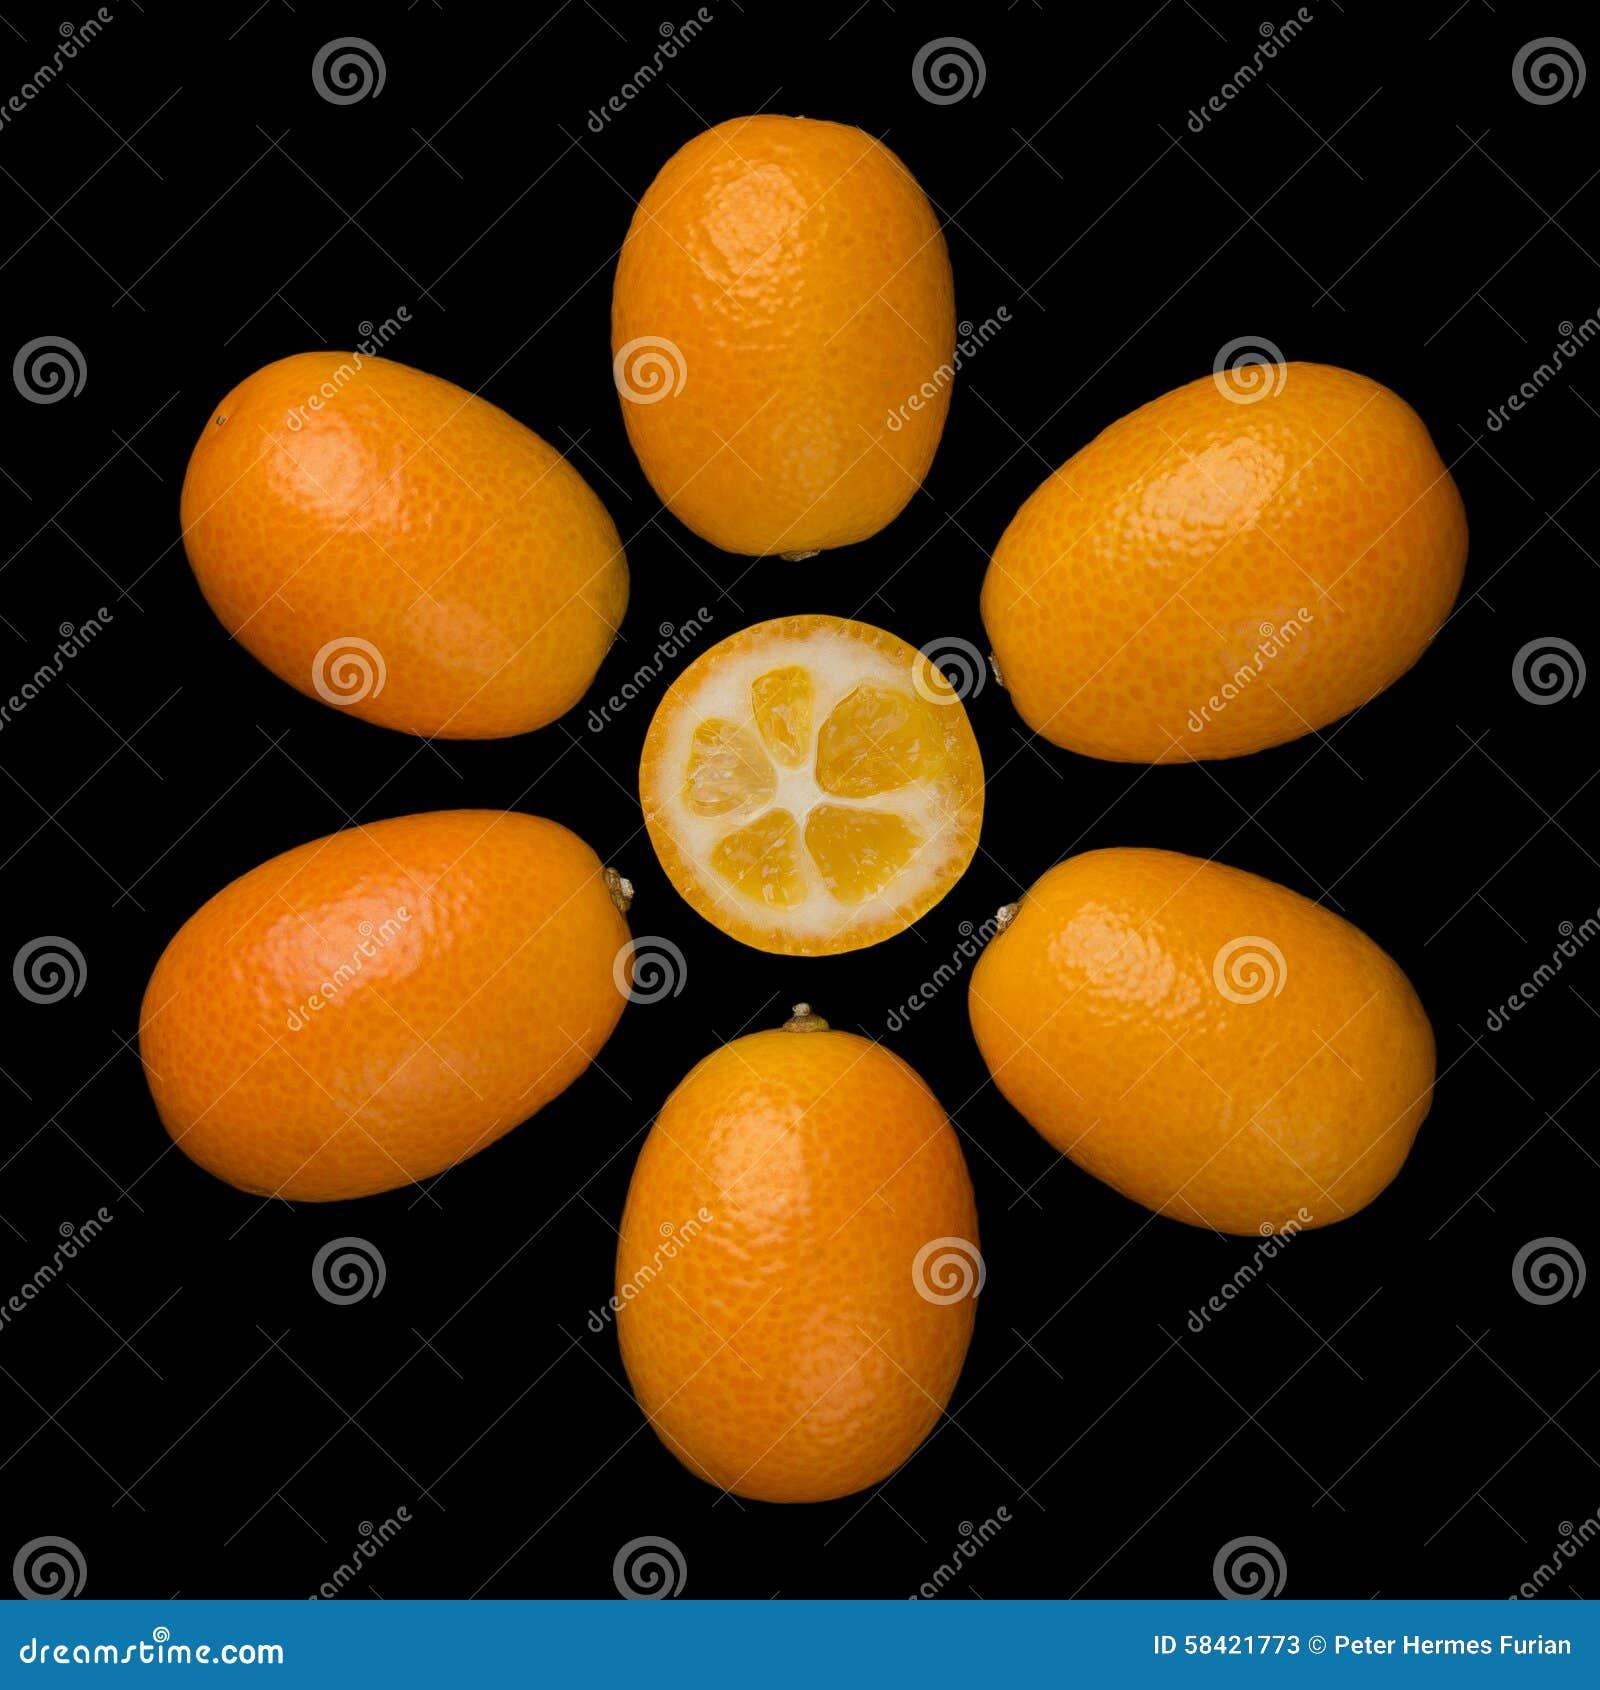 Oval Kumquats Forming A Sun Symbol On Black Background Stock Image